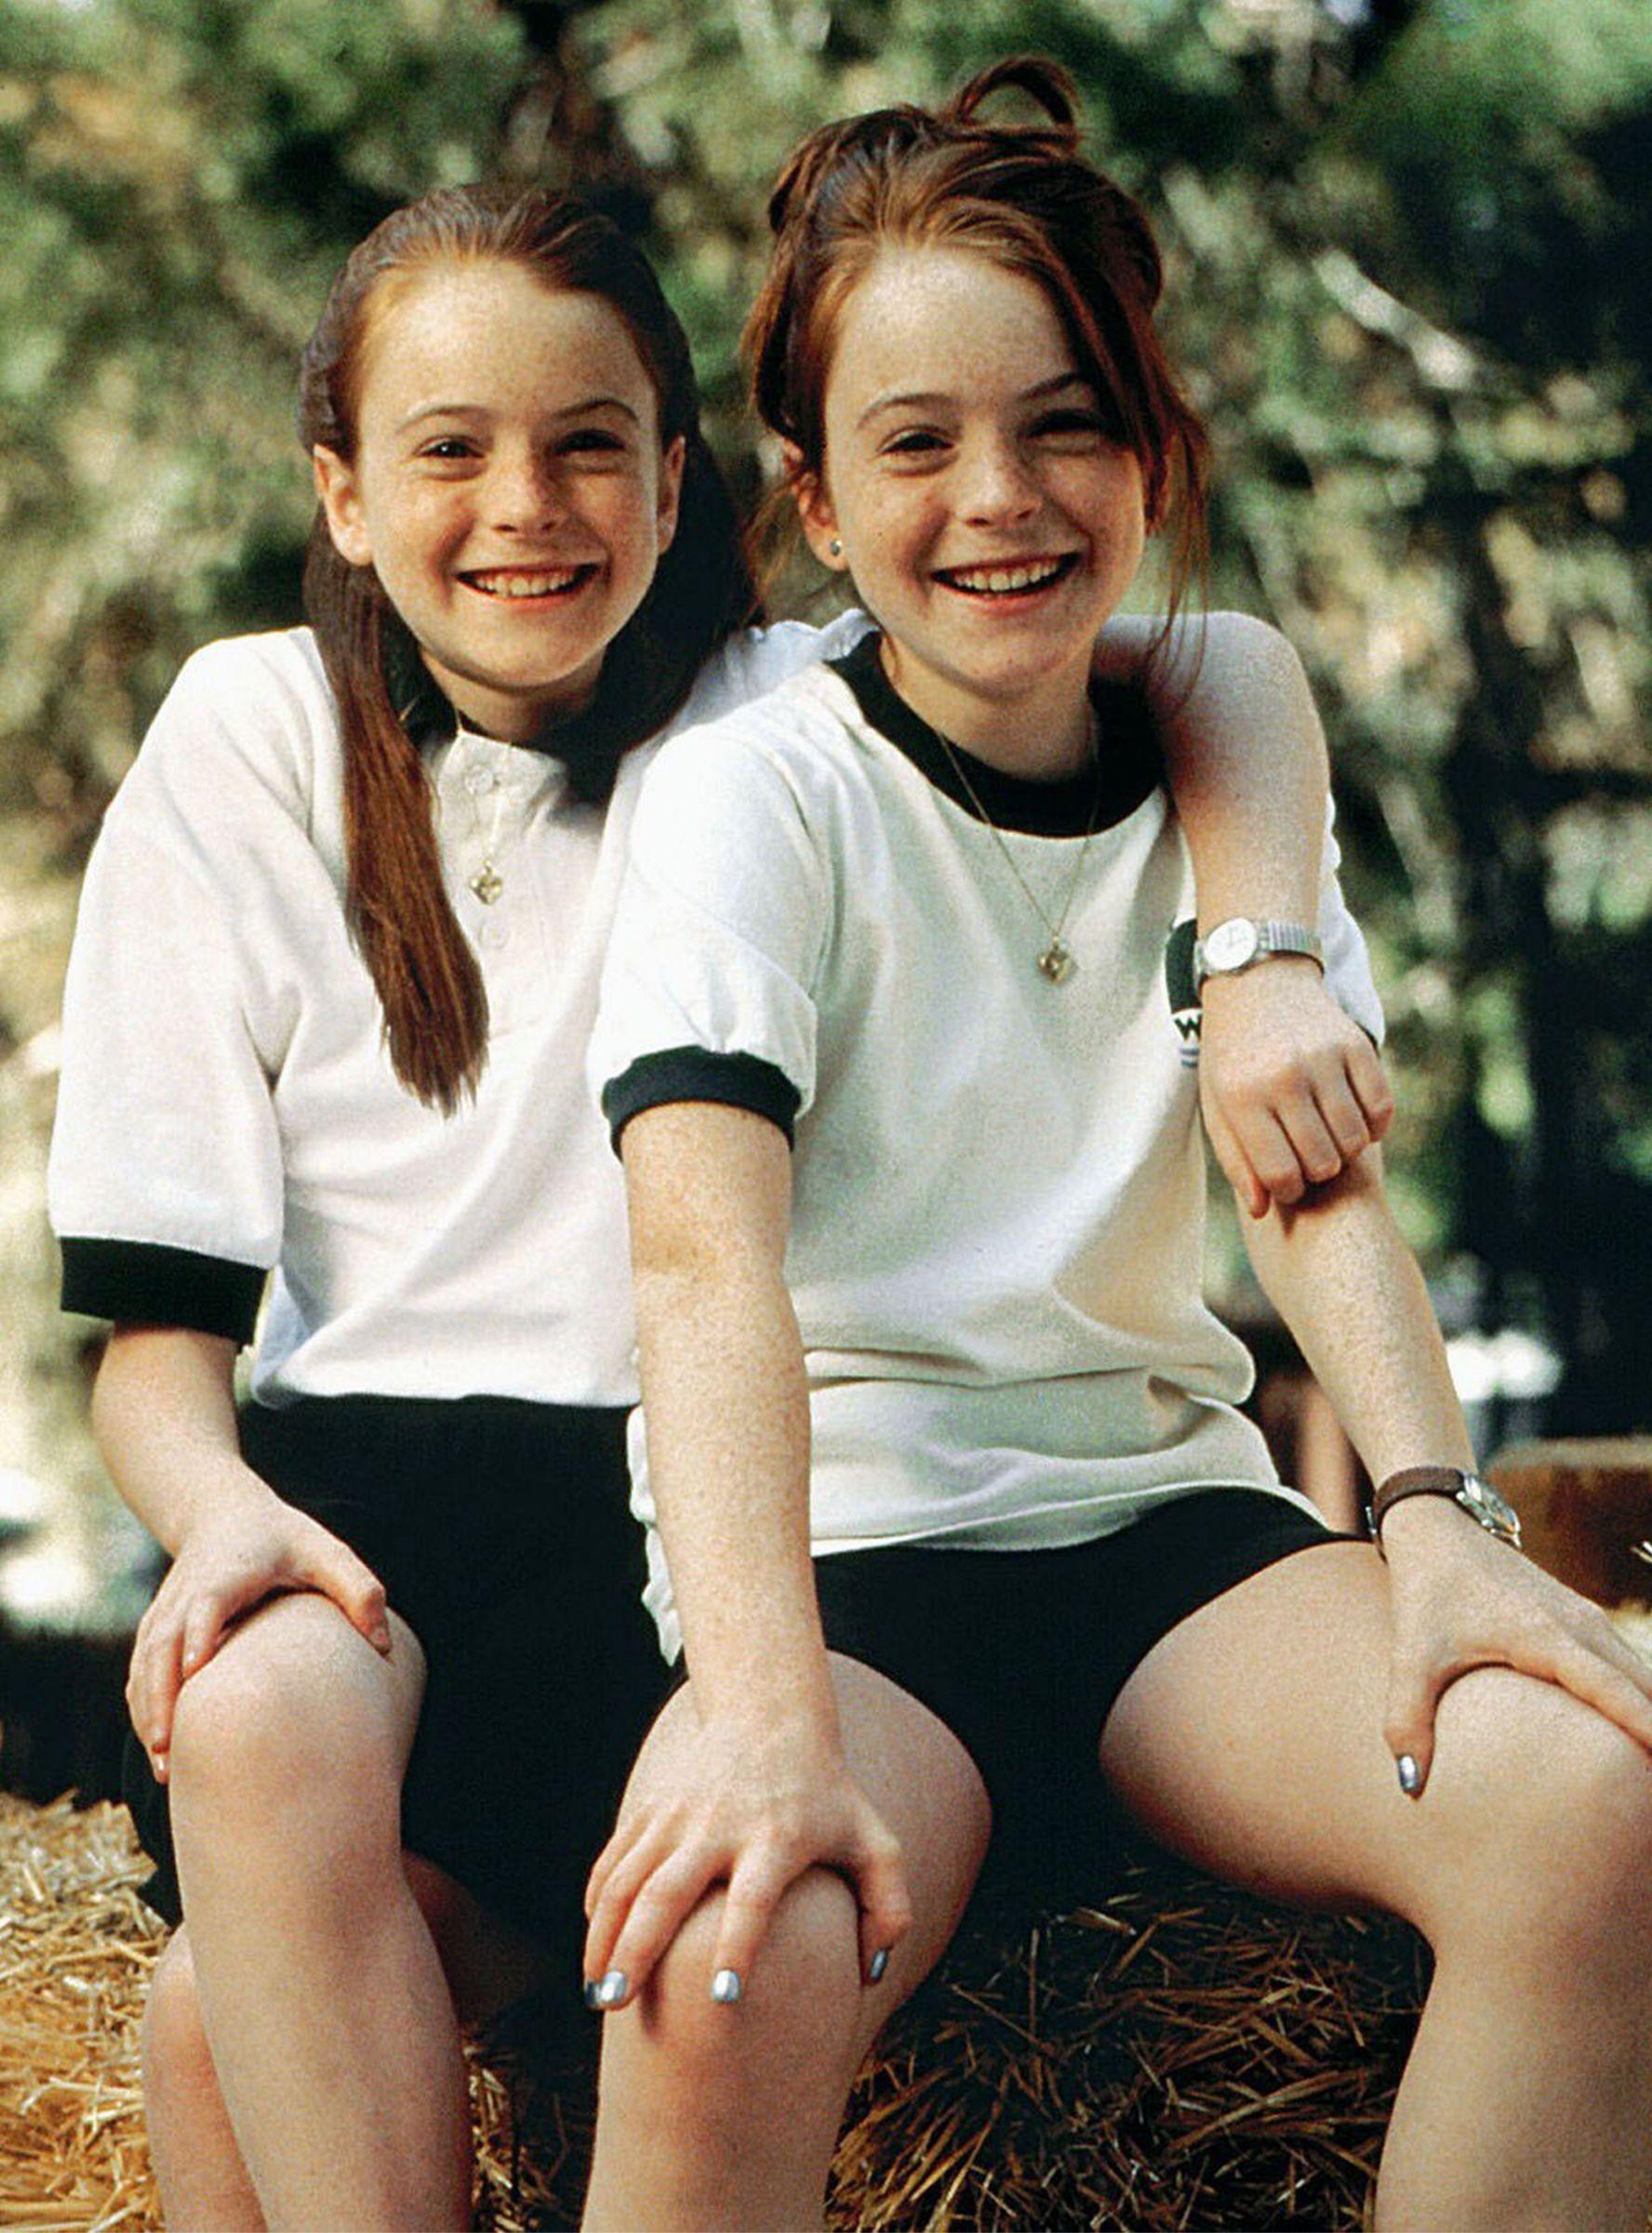 Are You A Hallie Parker Or An Annie James? | Parent trap, Lindsay lohan,  Movies